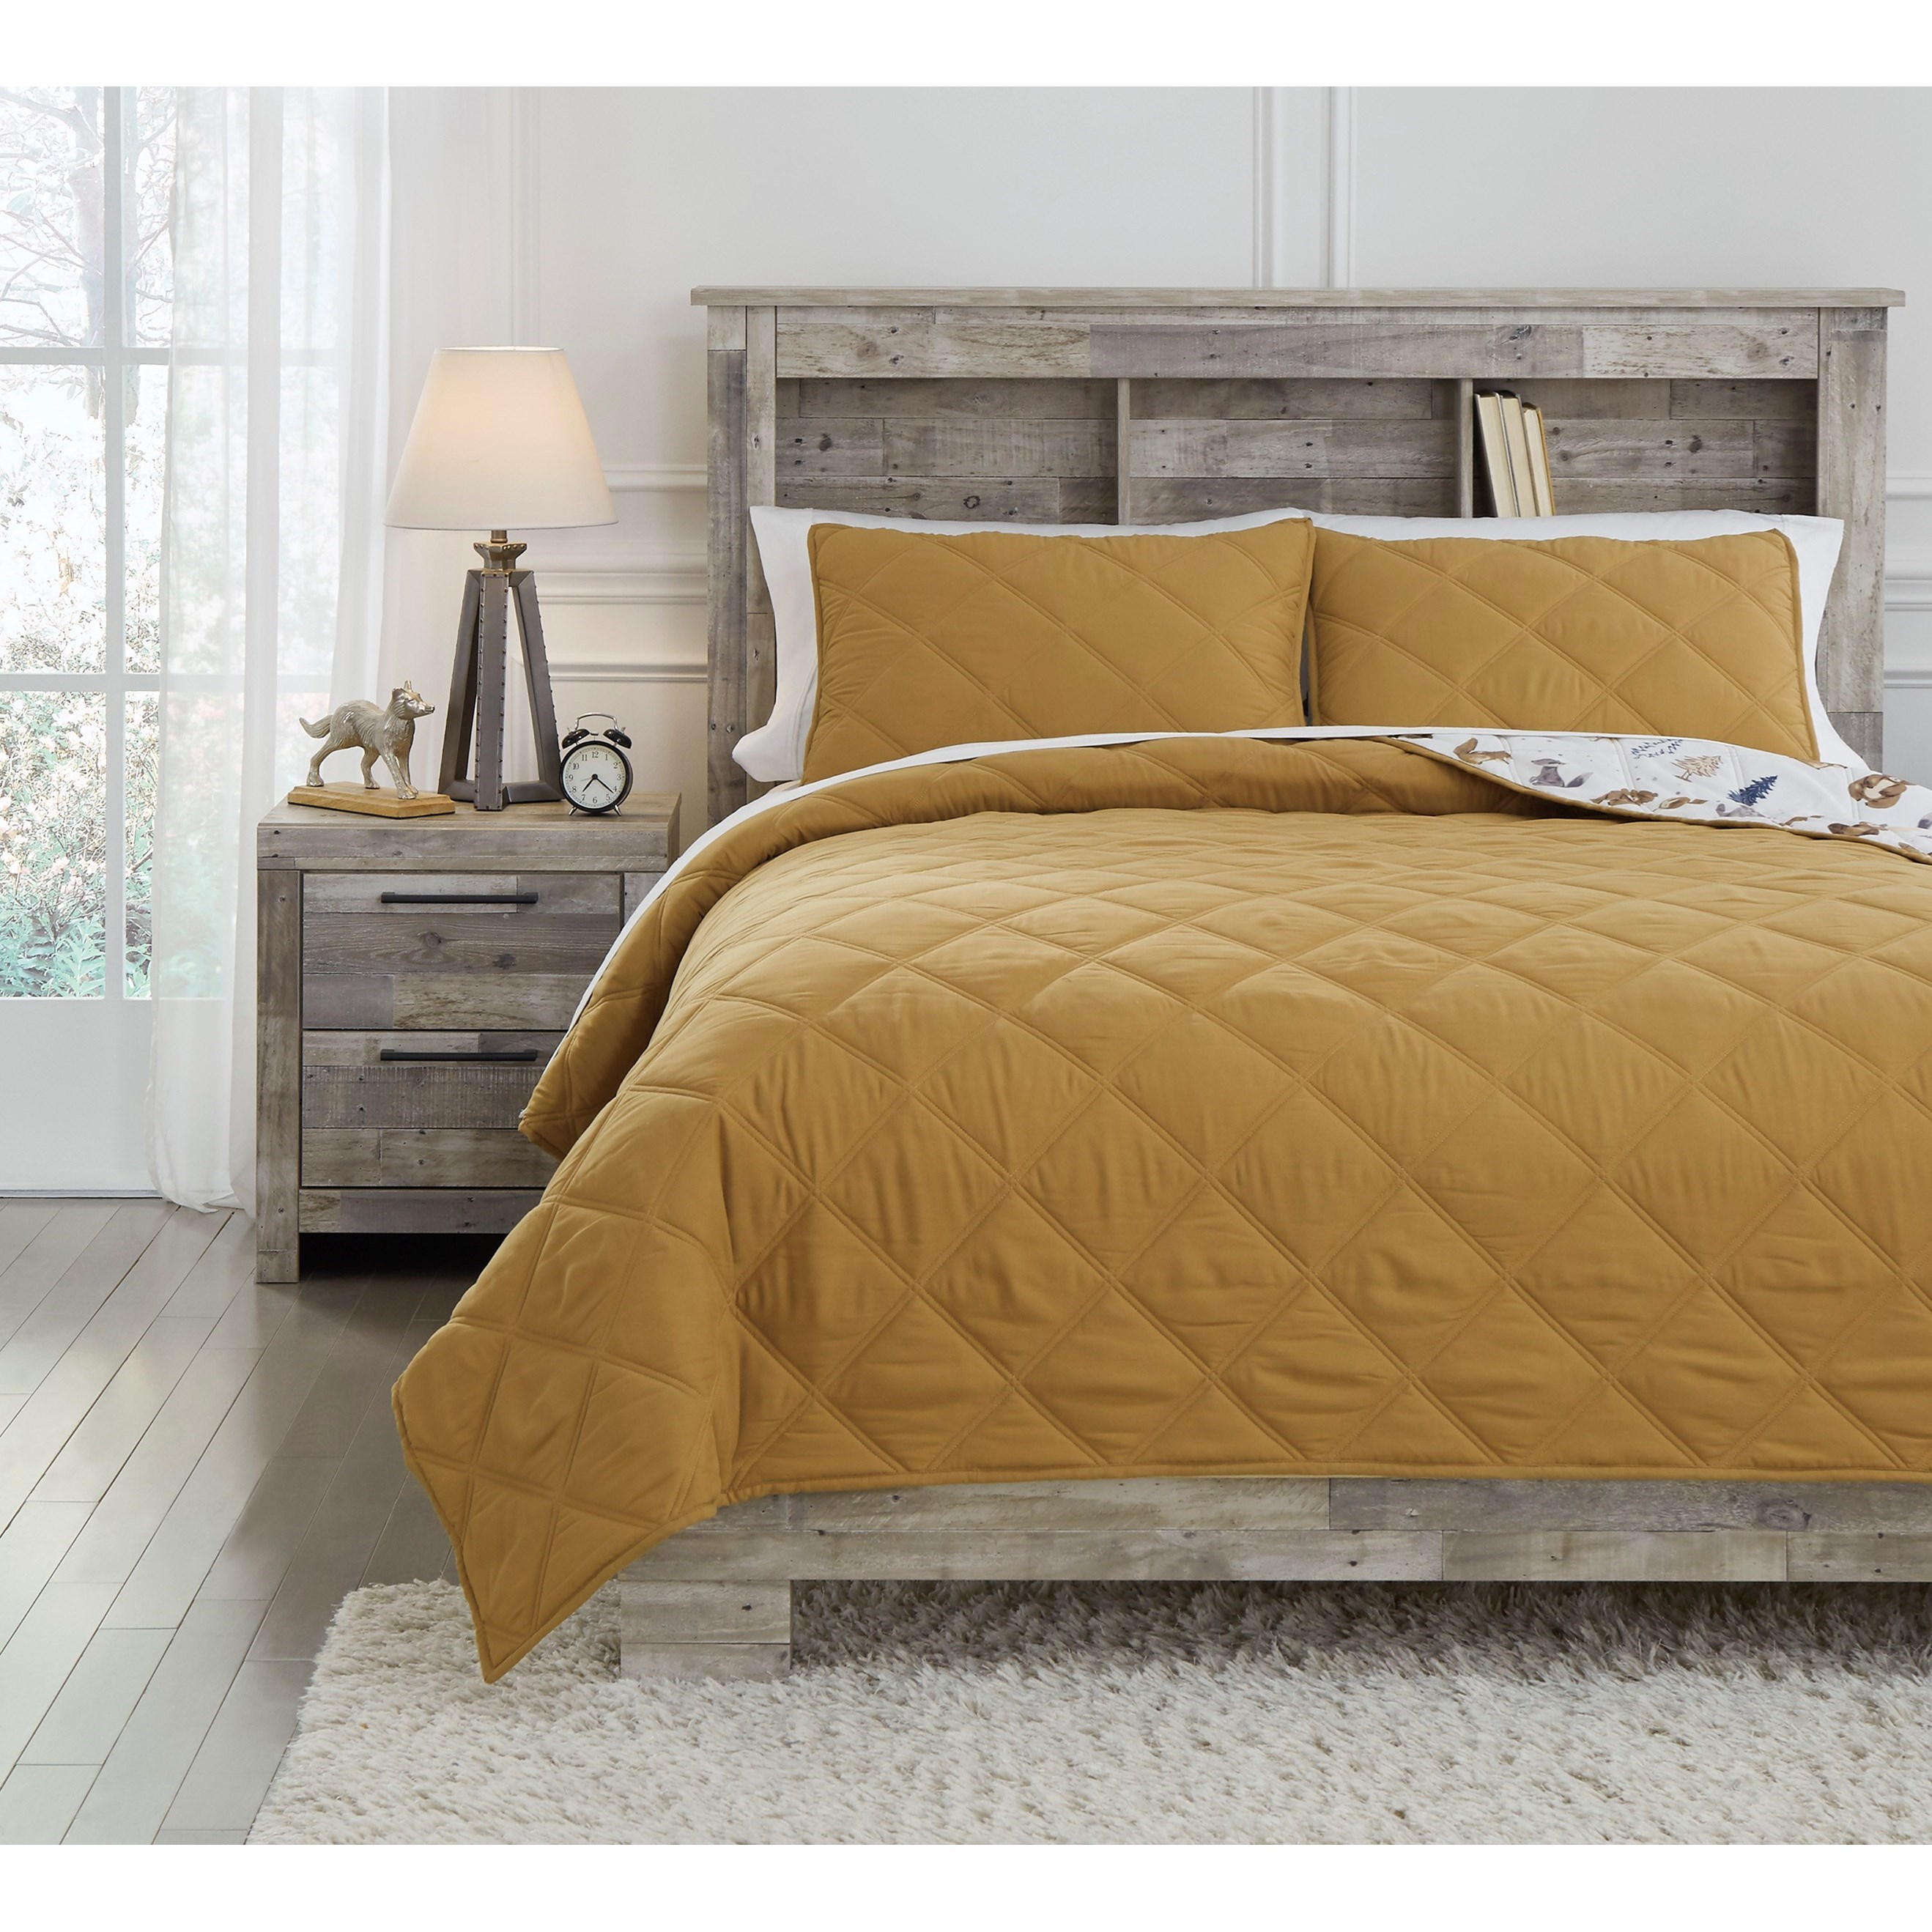 Bedding Sets Full Cooperlen Golden Brown Quilt Set by Signature Design by Ashley at Miller Waldrop Furniture and Decor